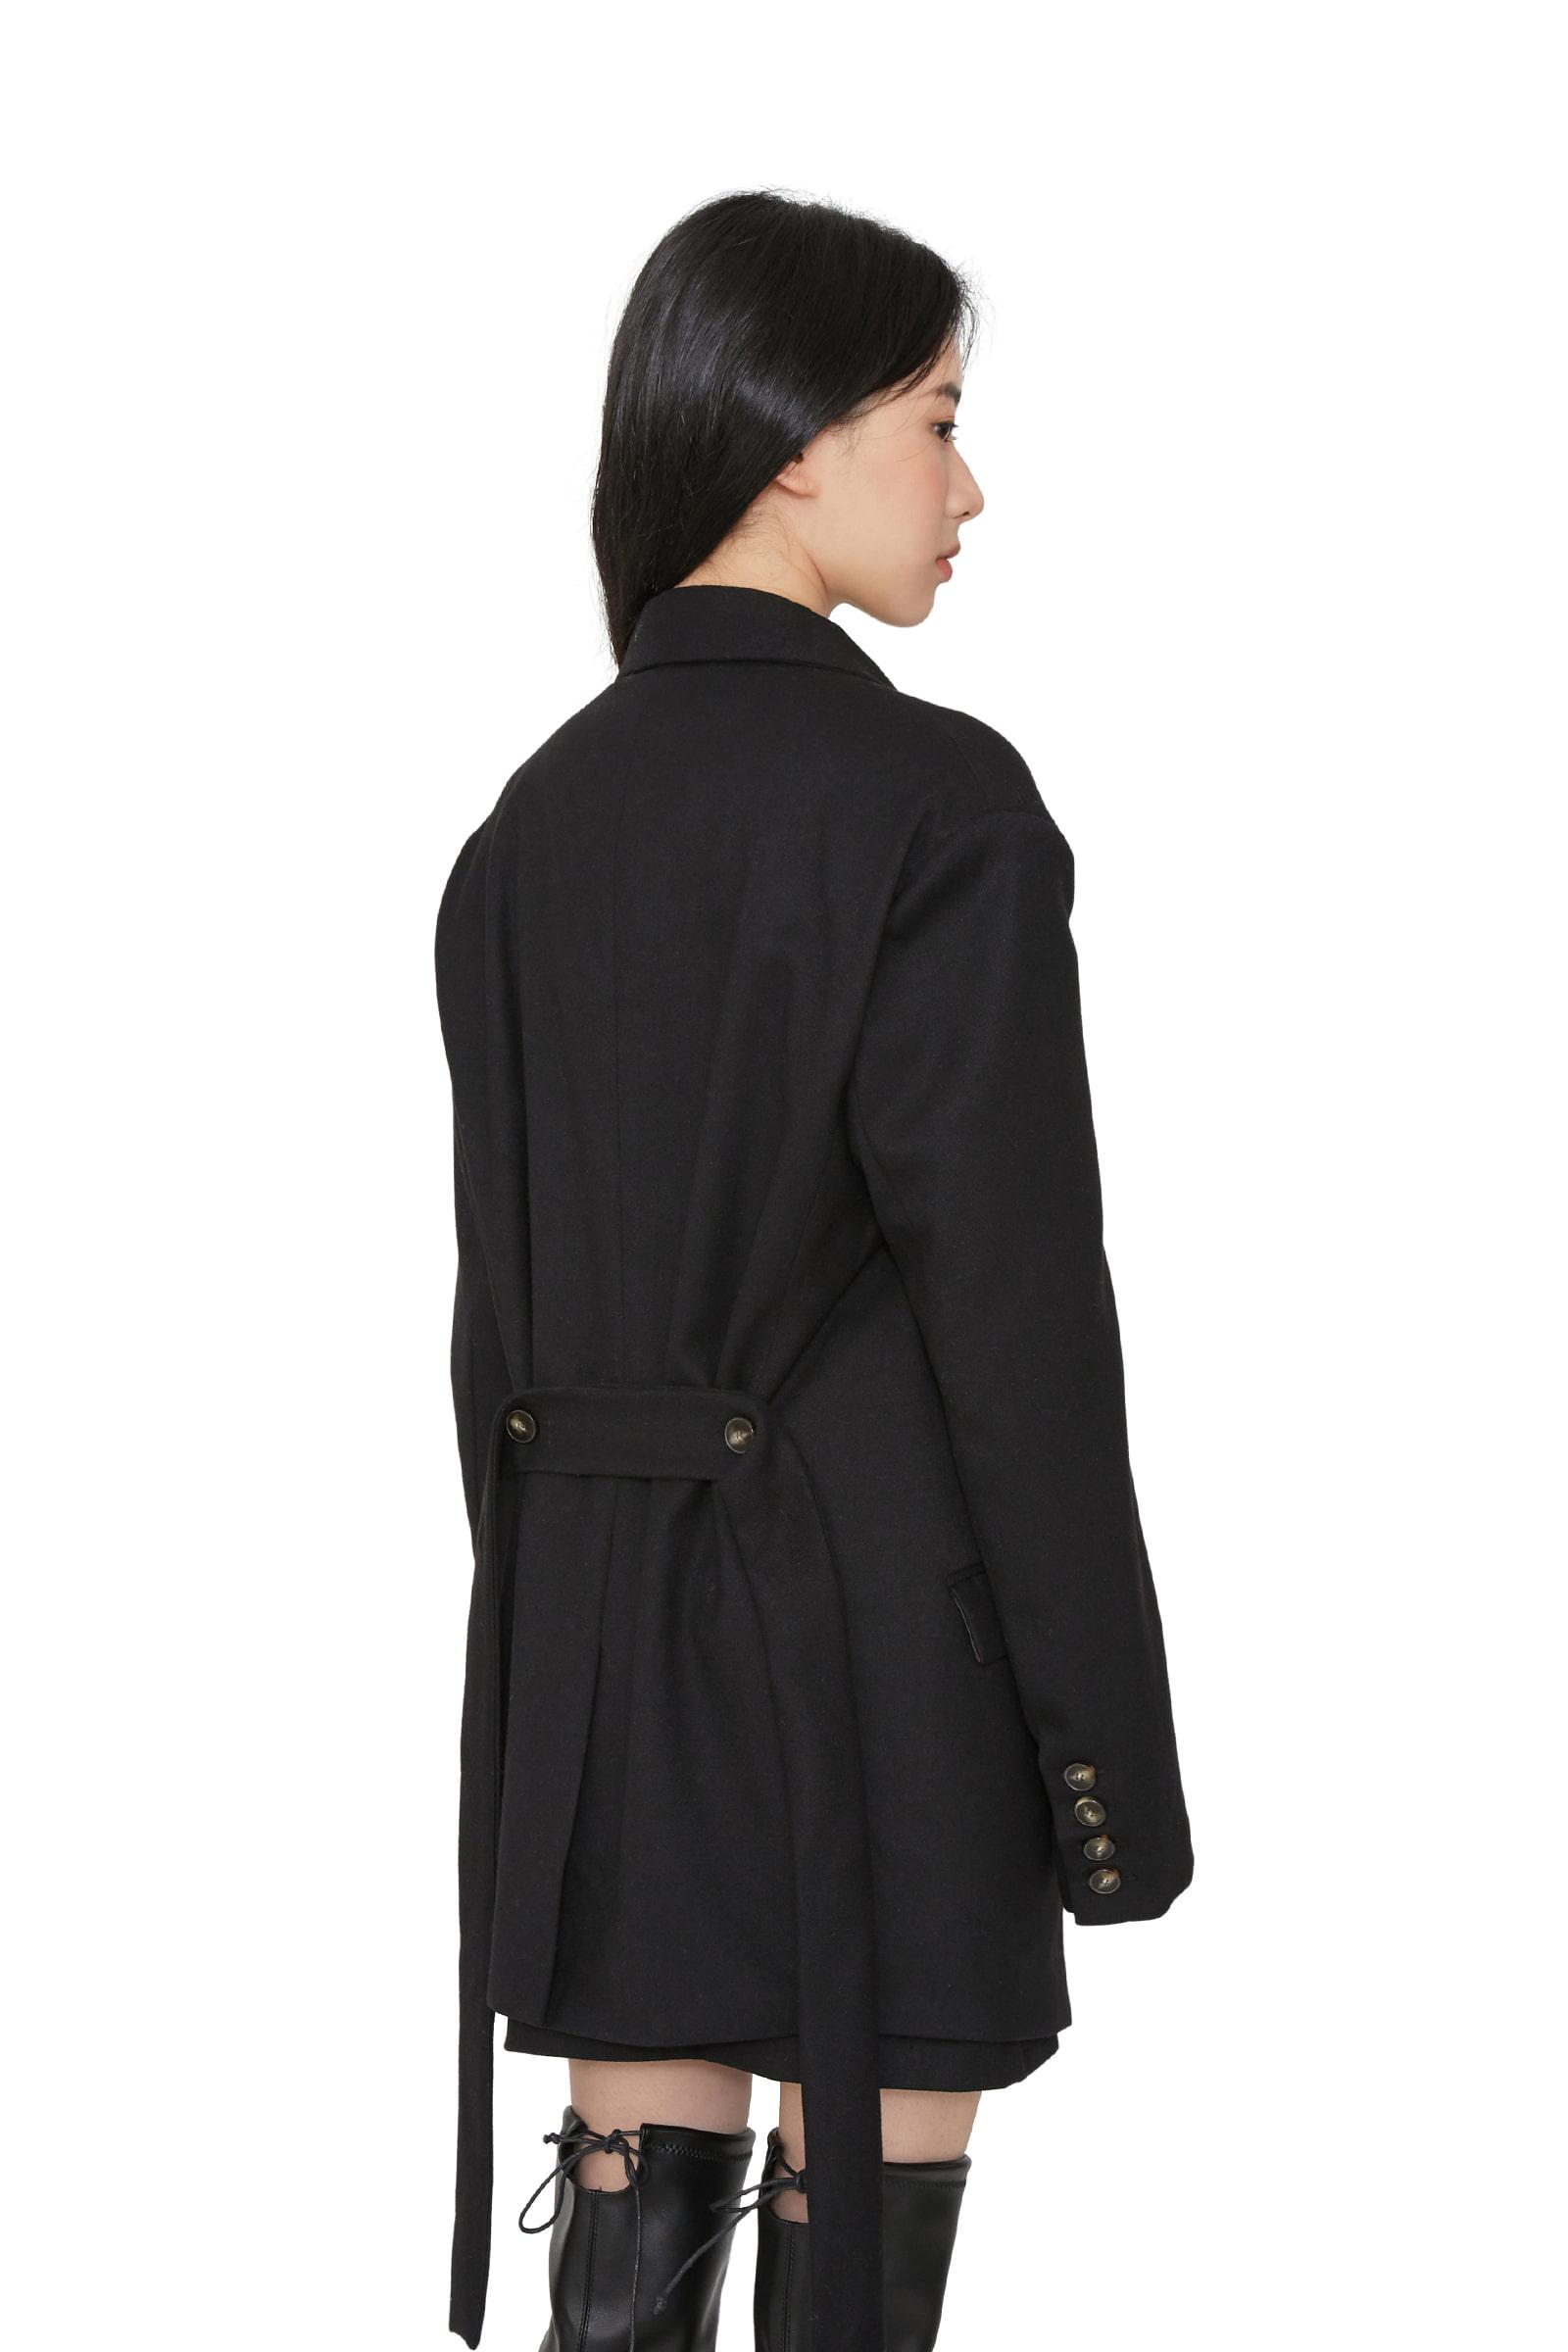 Push-over button blazer